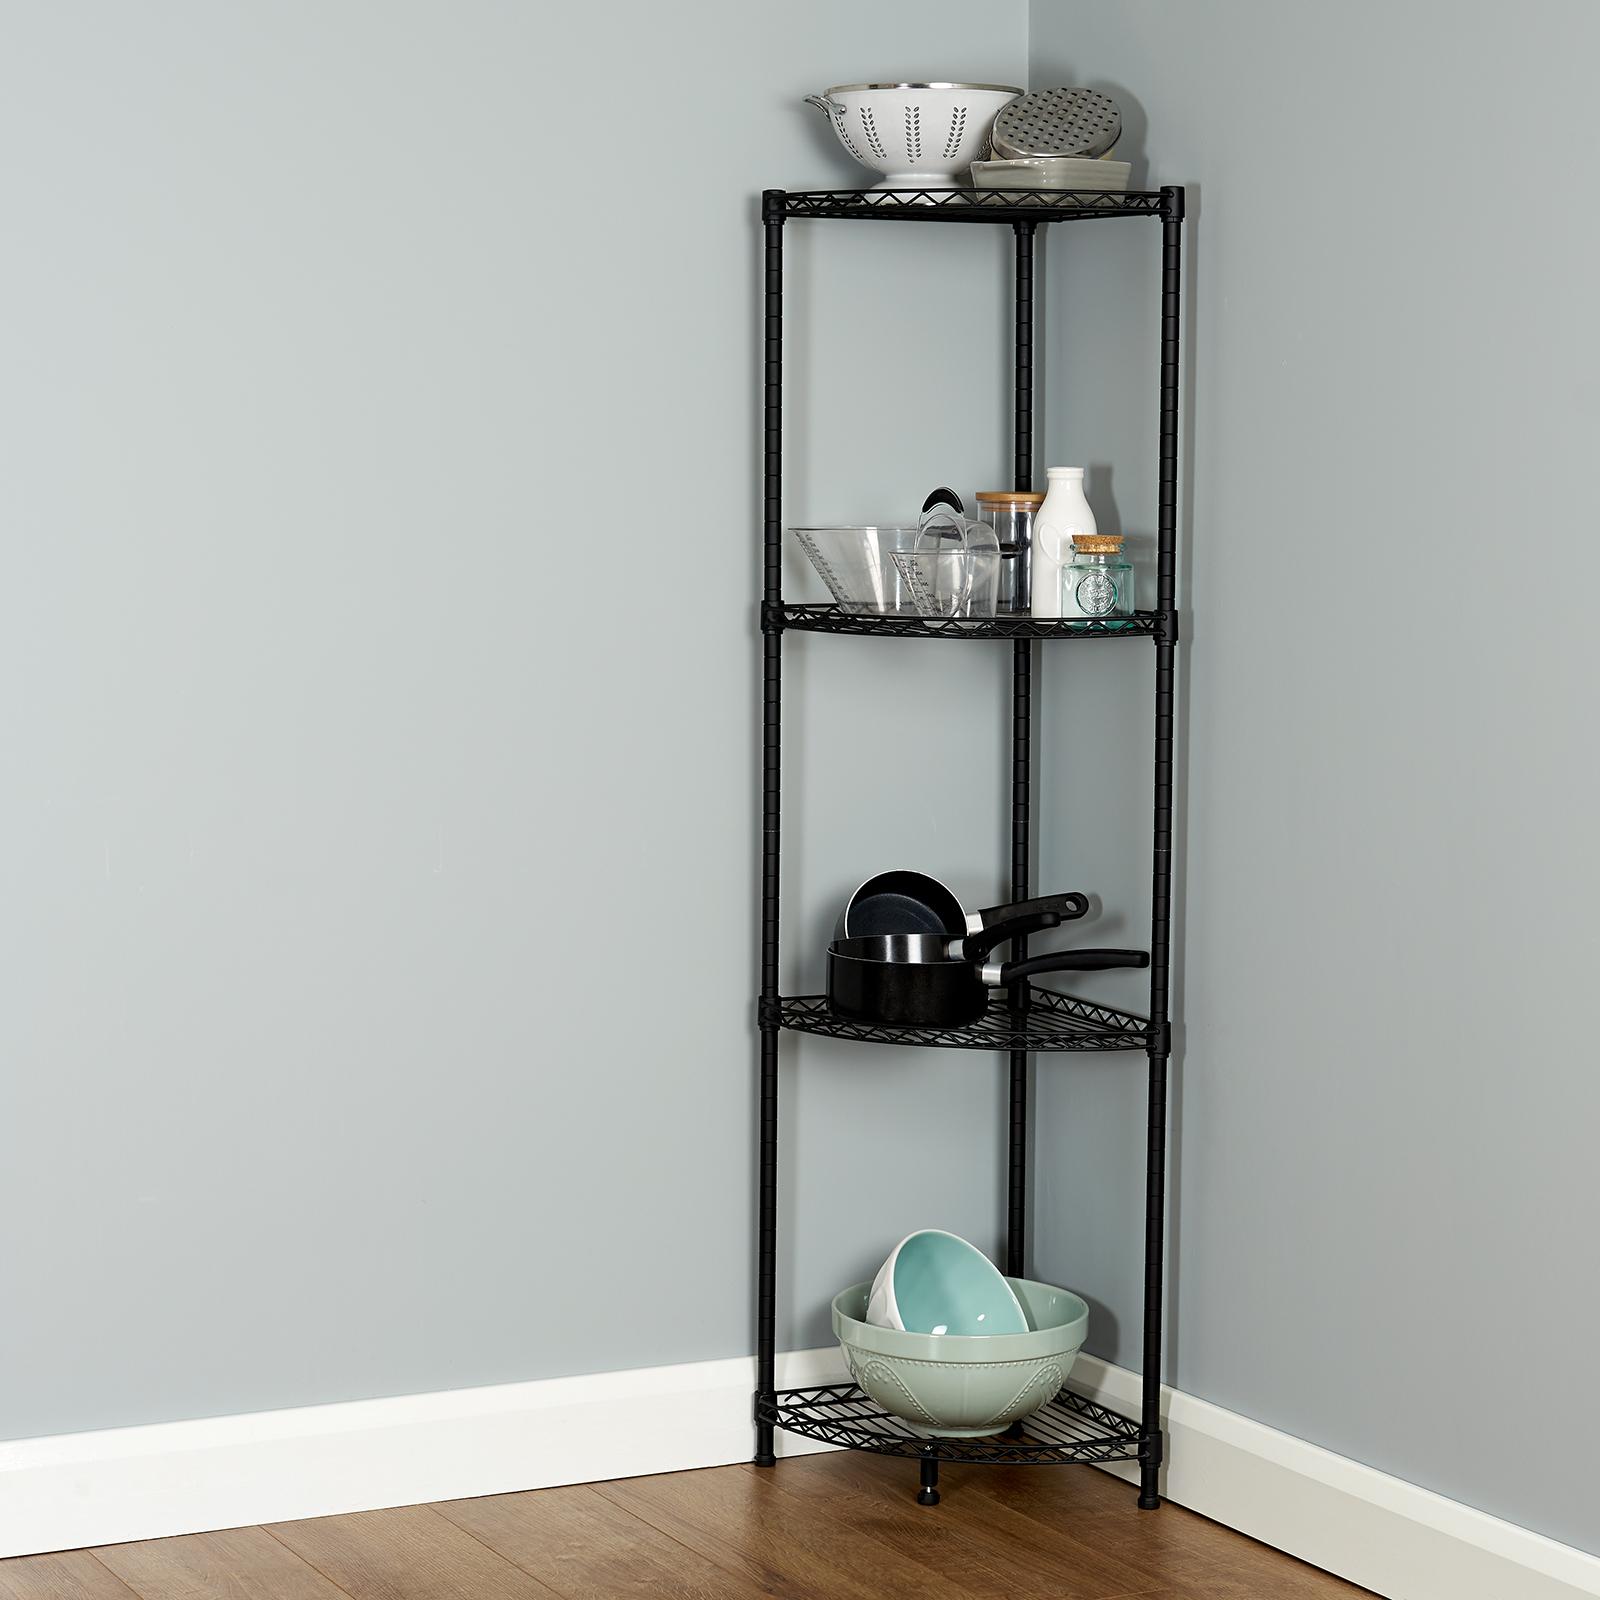 Details About Hartleys Metal Wire Corner Shelving Unit Storage Kitchen Pantry Shelves Racks